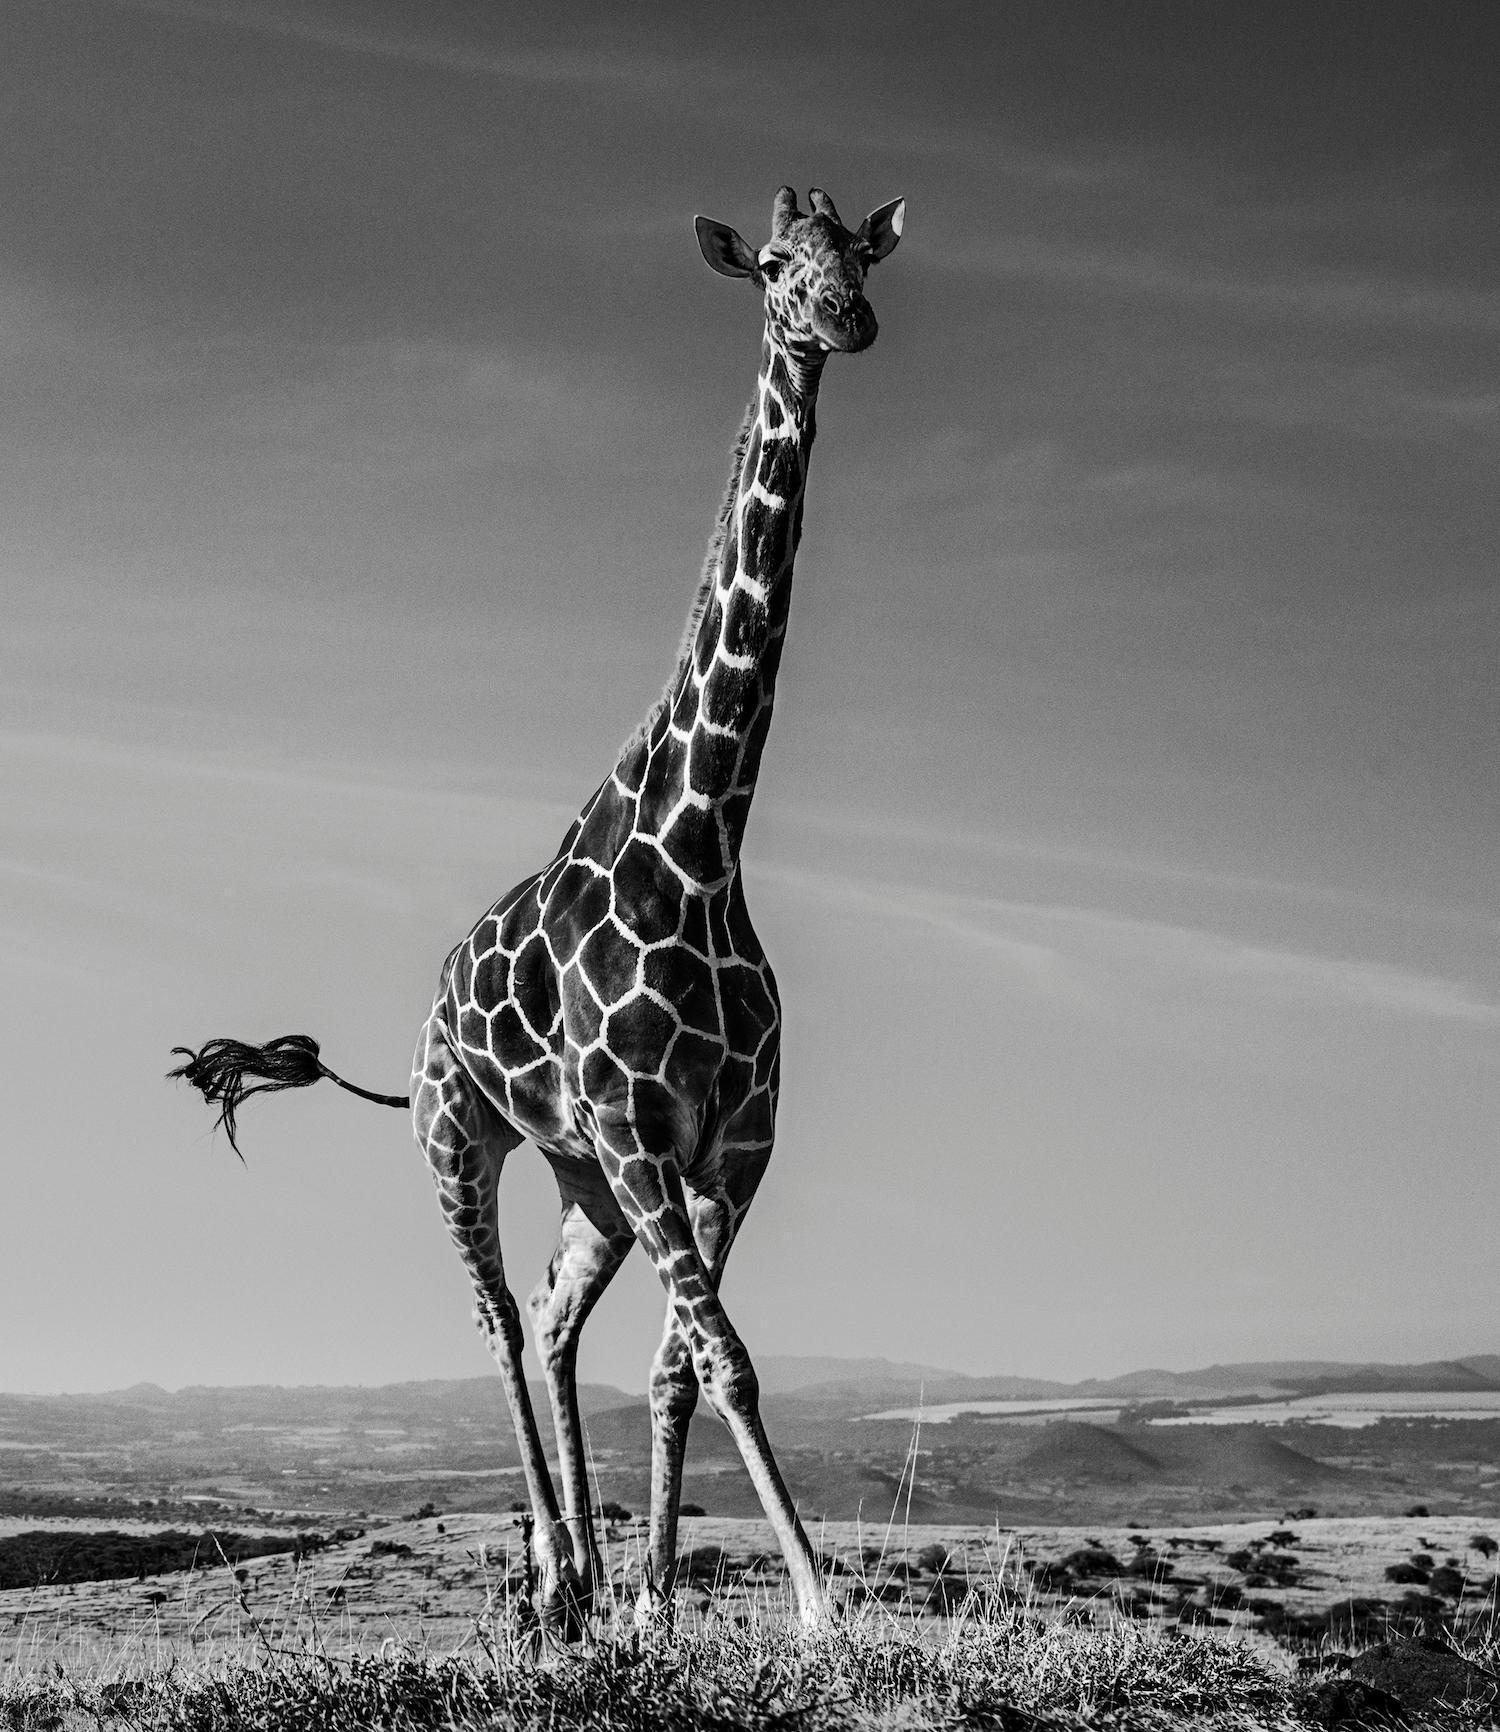 The Dancing Giraffe, Black and White Animal Photography